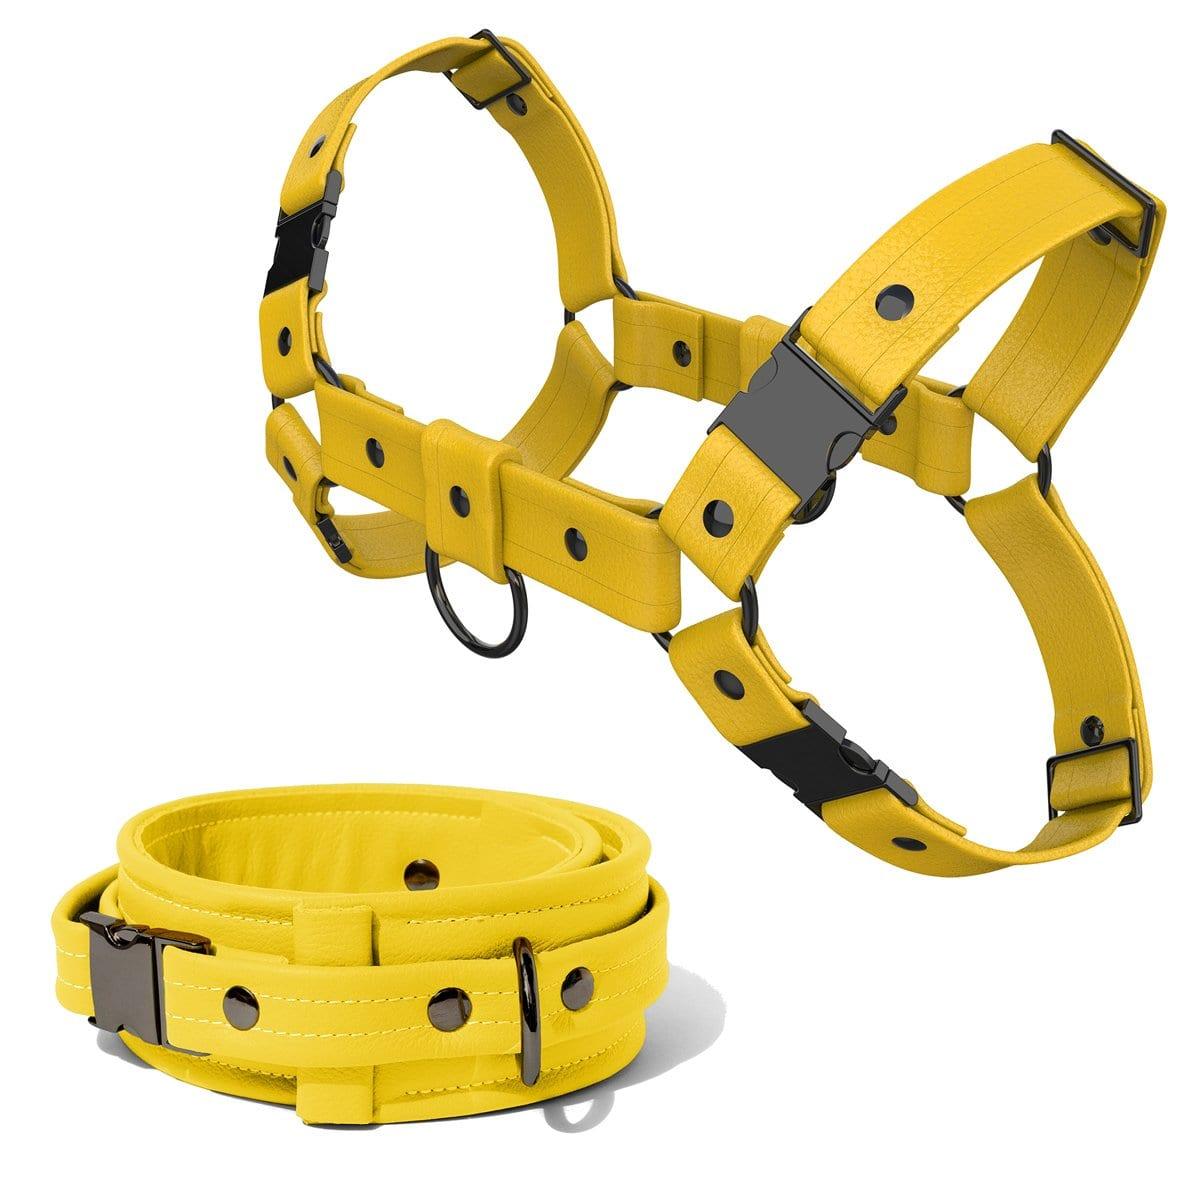 Bulldog Harness + Collar – Standard Leather – Yellow - Gun Metal Black Fittings